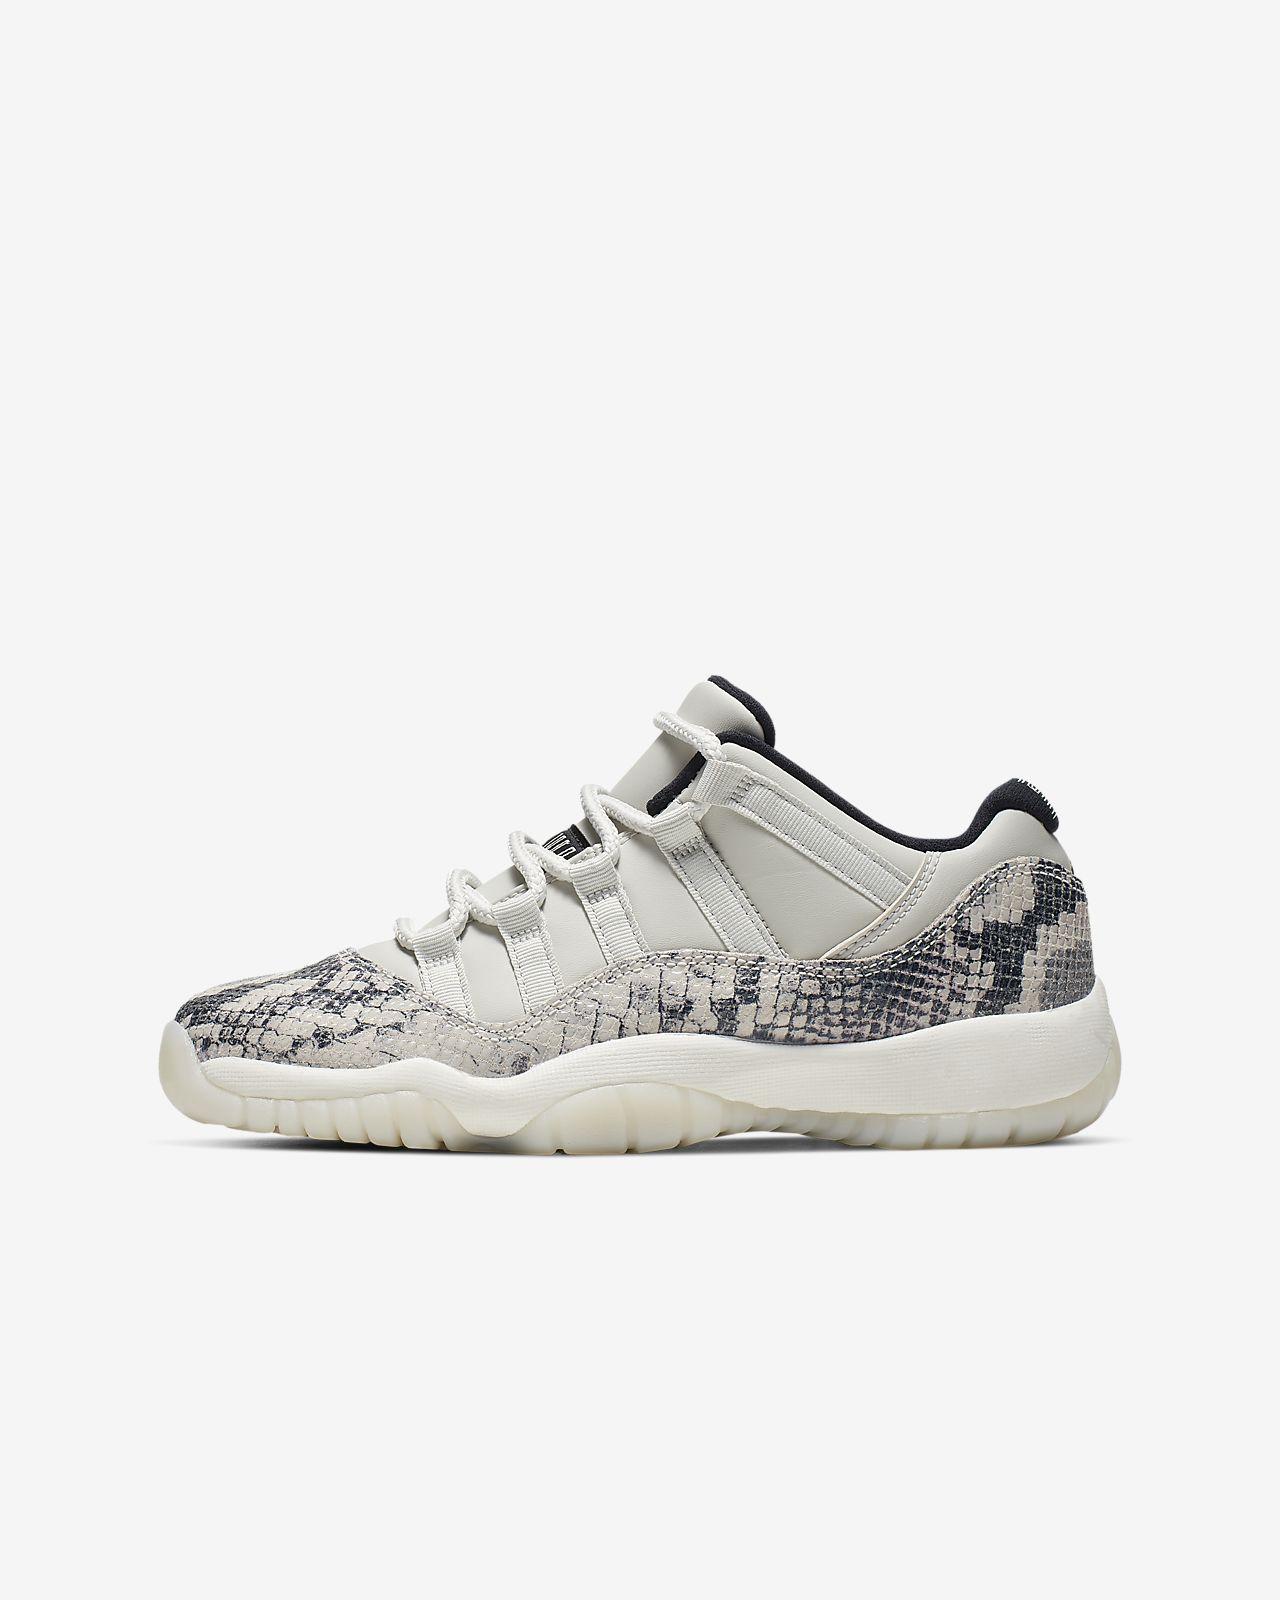 22f26f8f97 Air Jordan 11 Retro Low LE Older Kids' Shoe